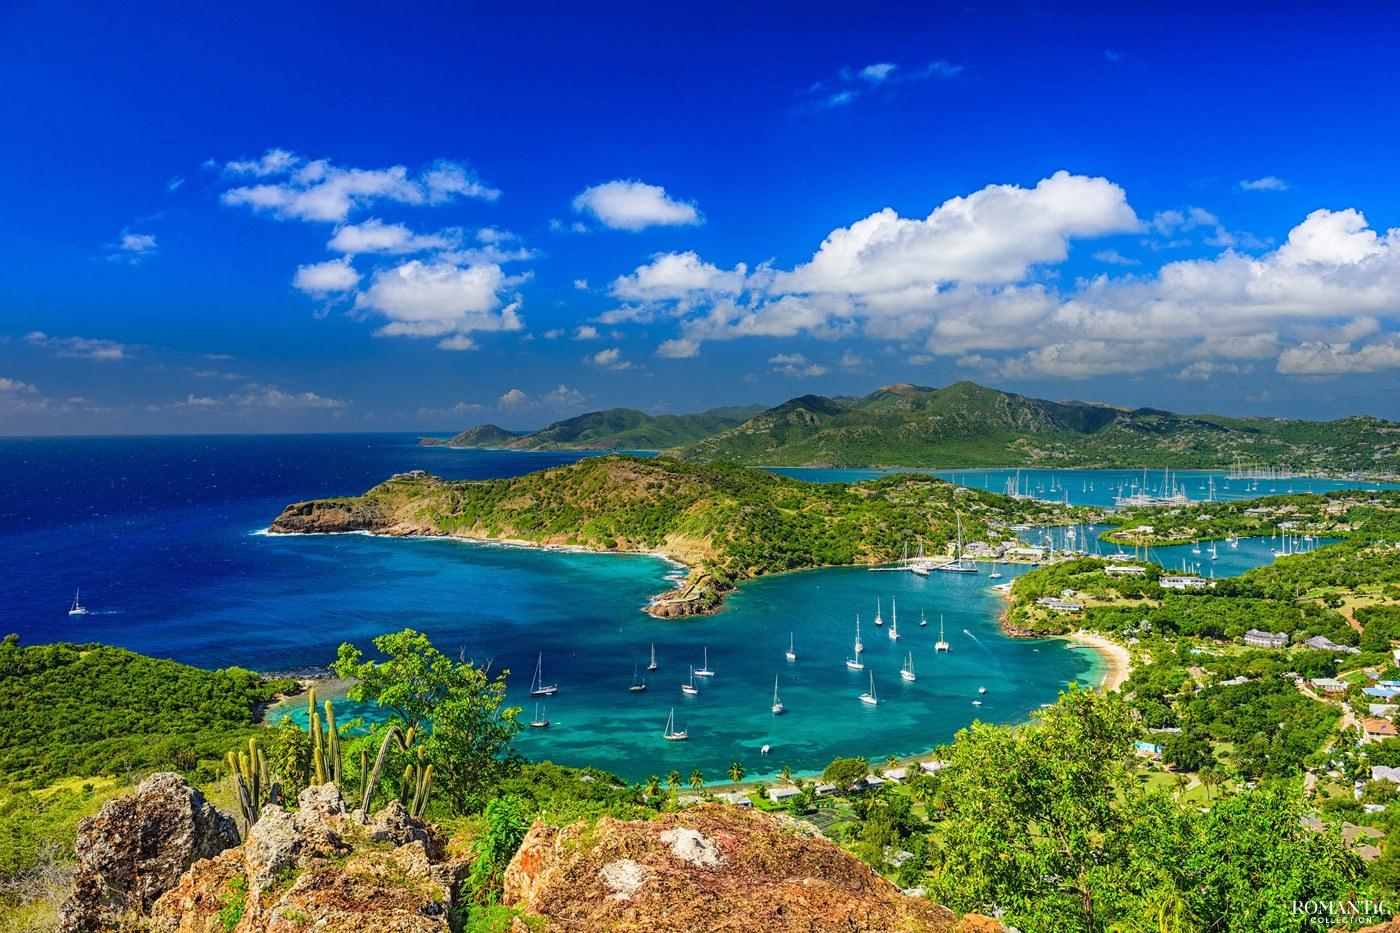 Пляжи Барбуда и Антигуа, Каррибы